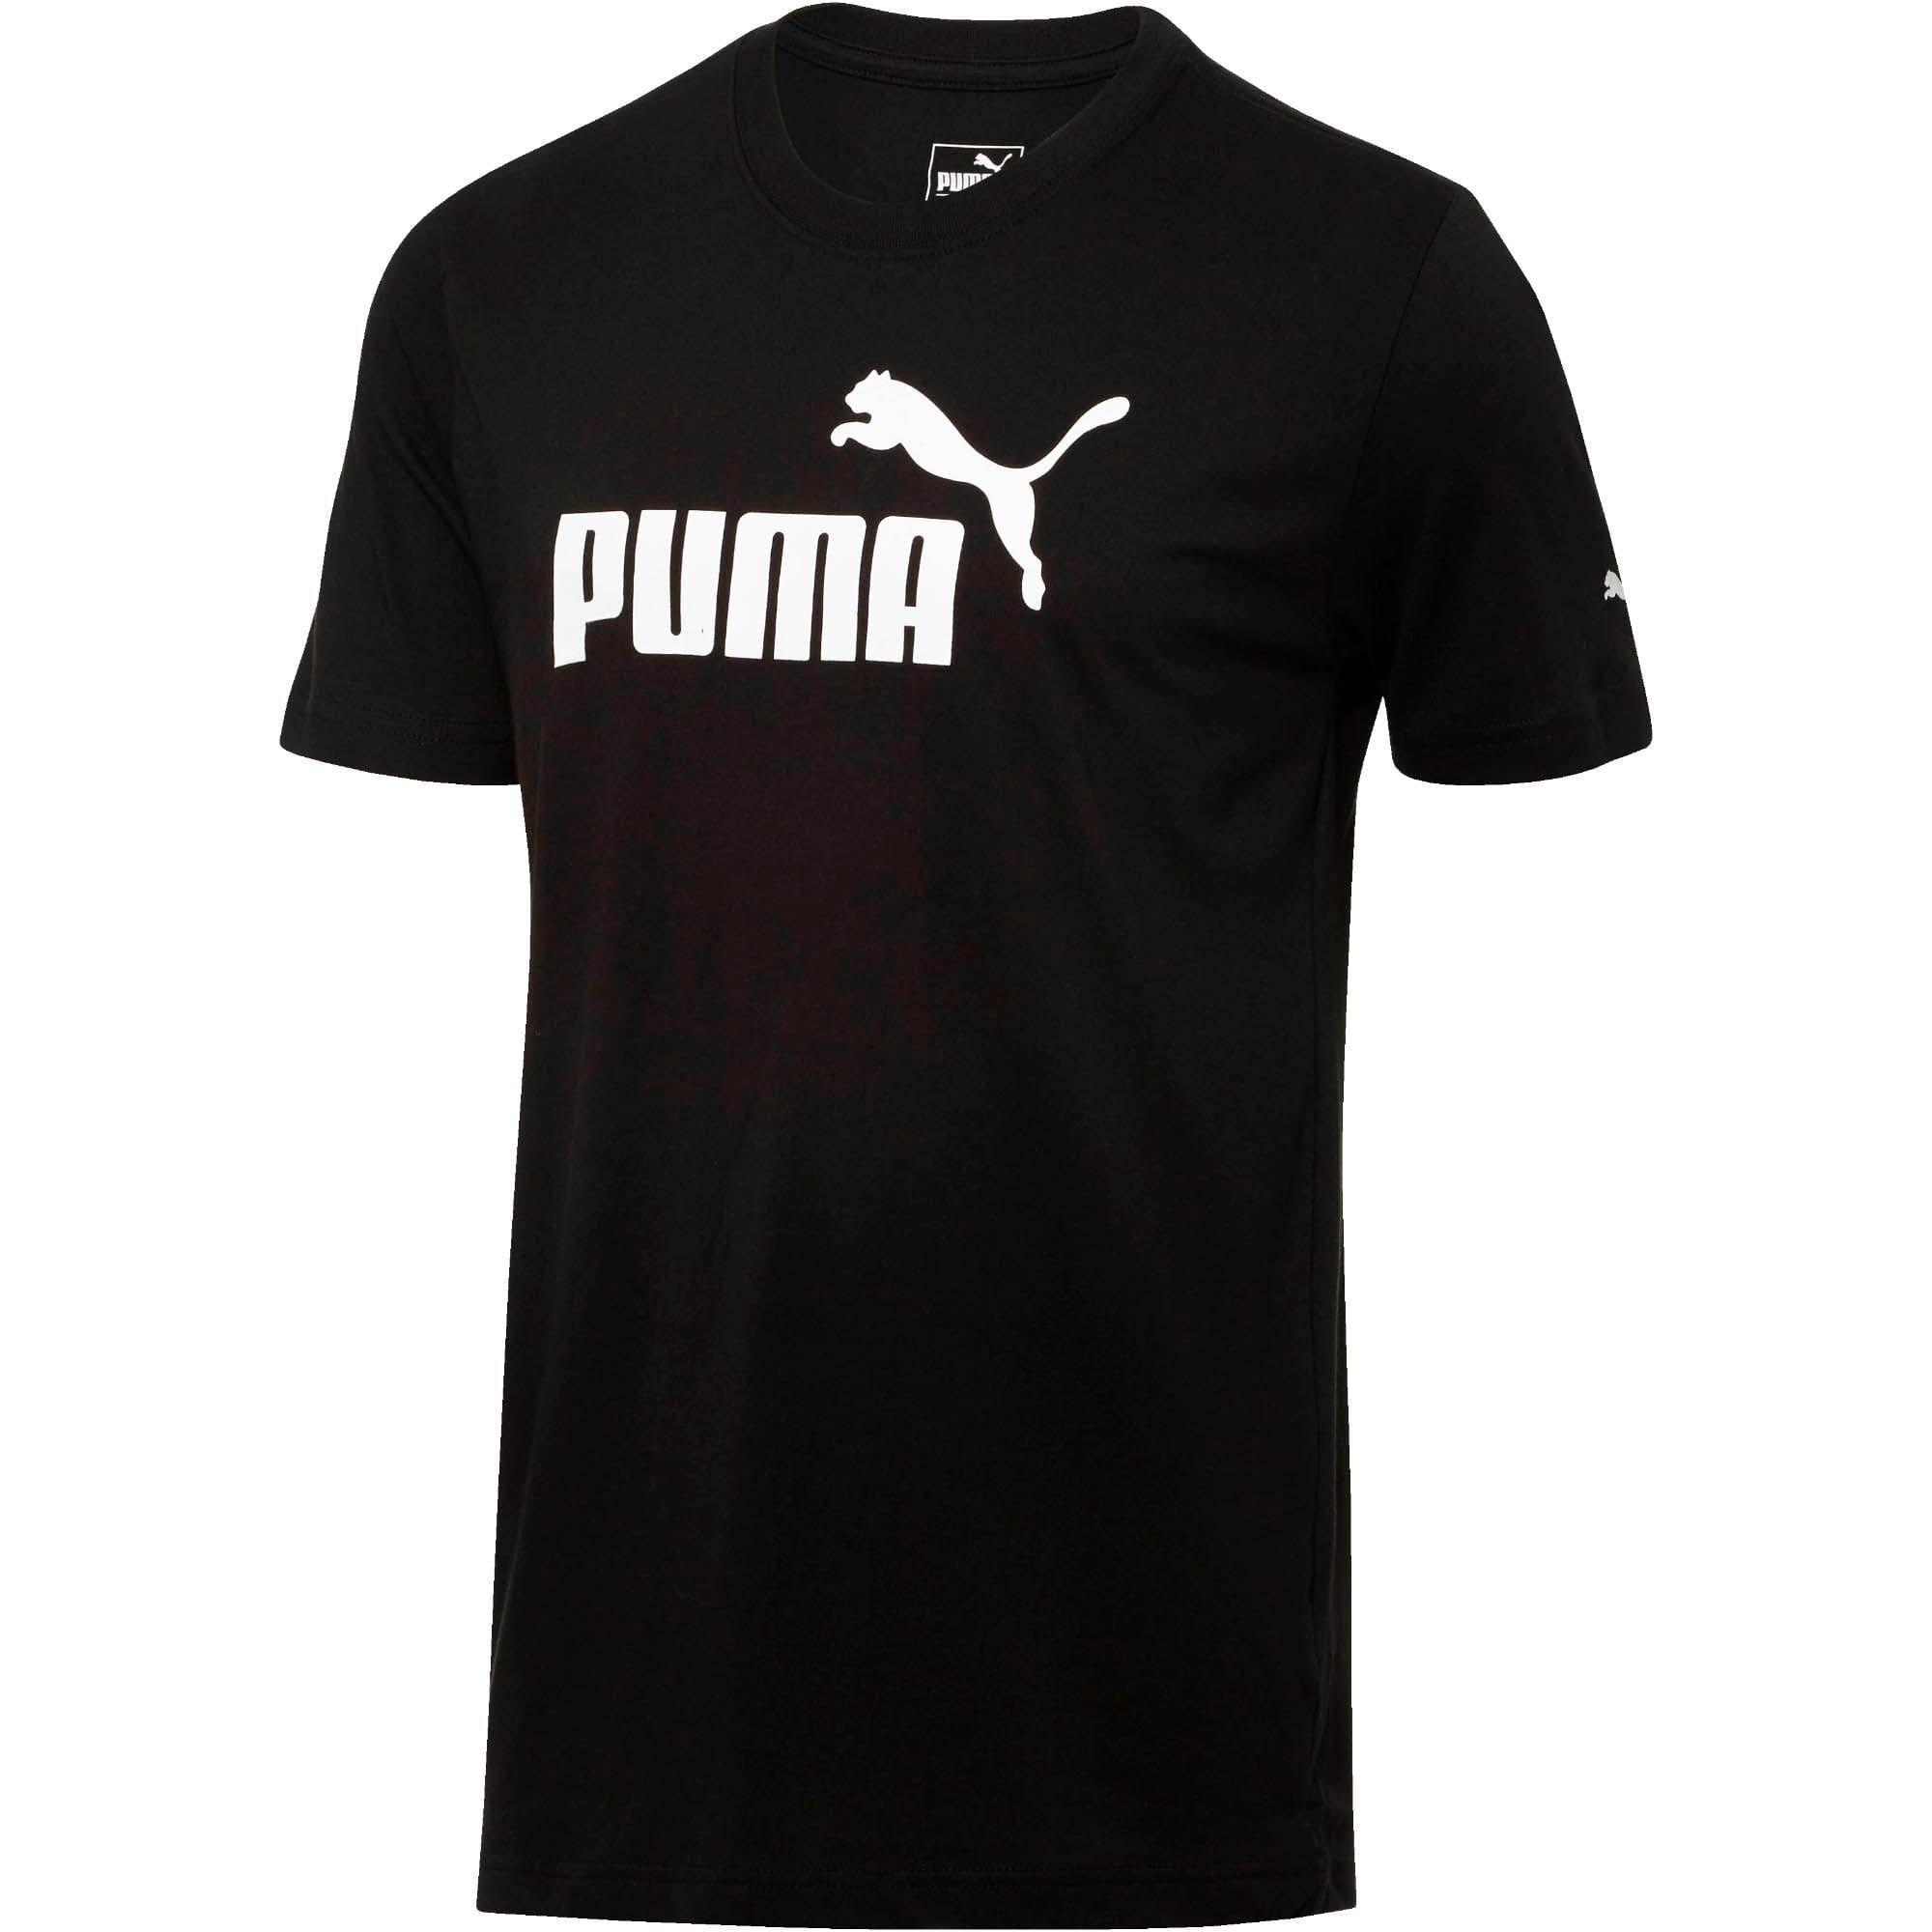 Thumbnail 1 of No. 1 Logo T-Shirt, black, medium